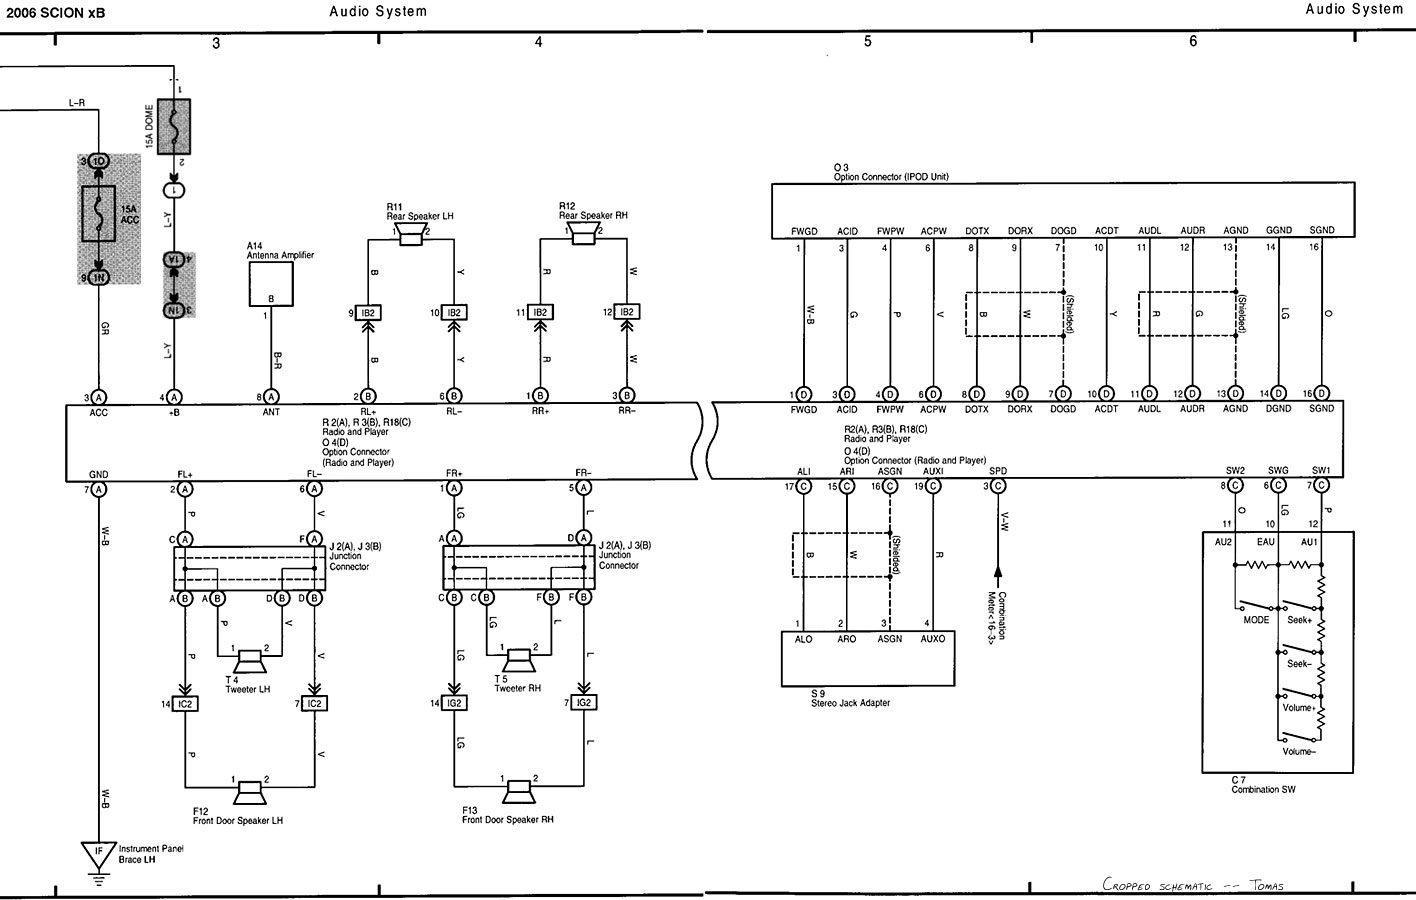 2005 scion tc radio wiring diagram?t\\\=1508751668 avs 7 switch box wiring diagram air ride suspension controller amphicar wiring diagram at edmiracle.co